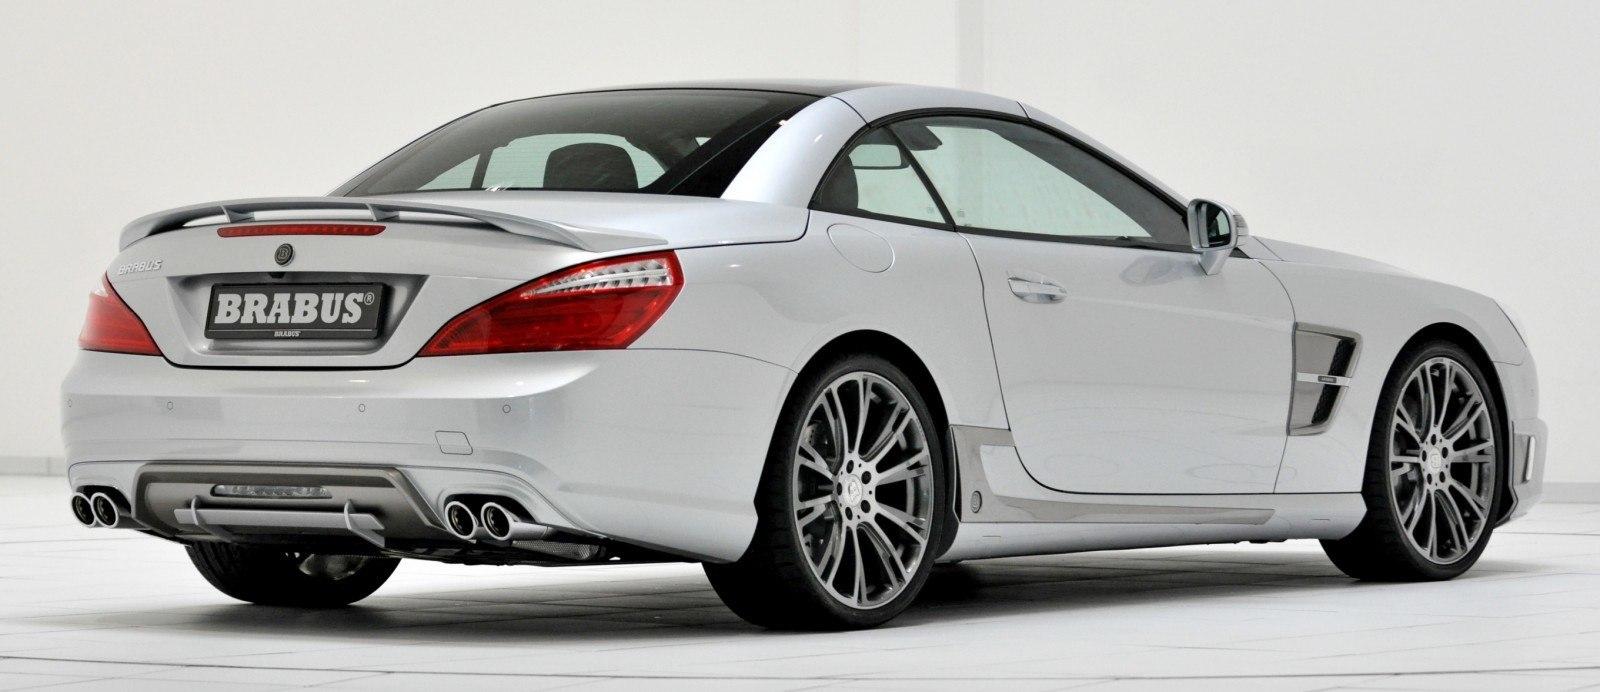 BRABUS Mercedes-Benz SL550 R231 39